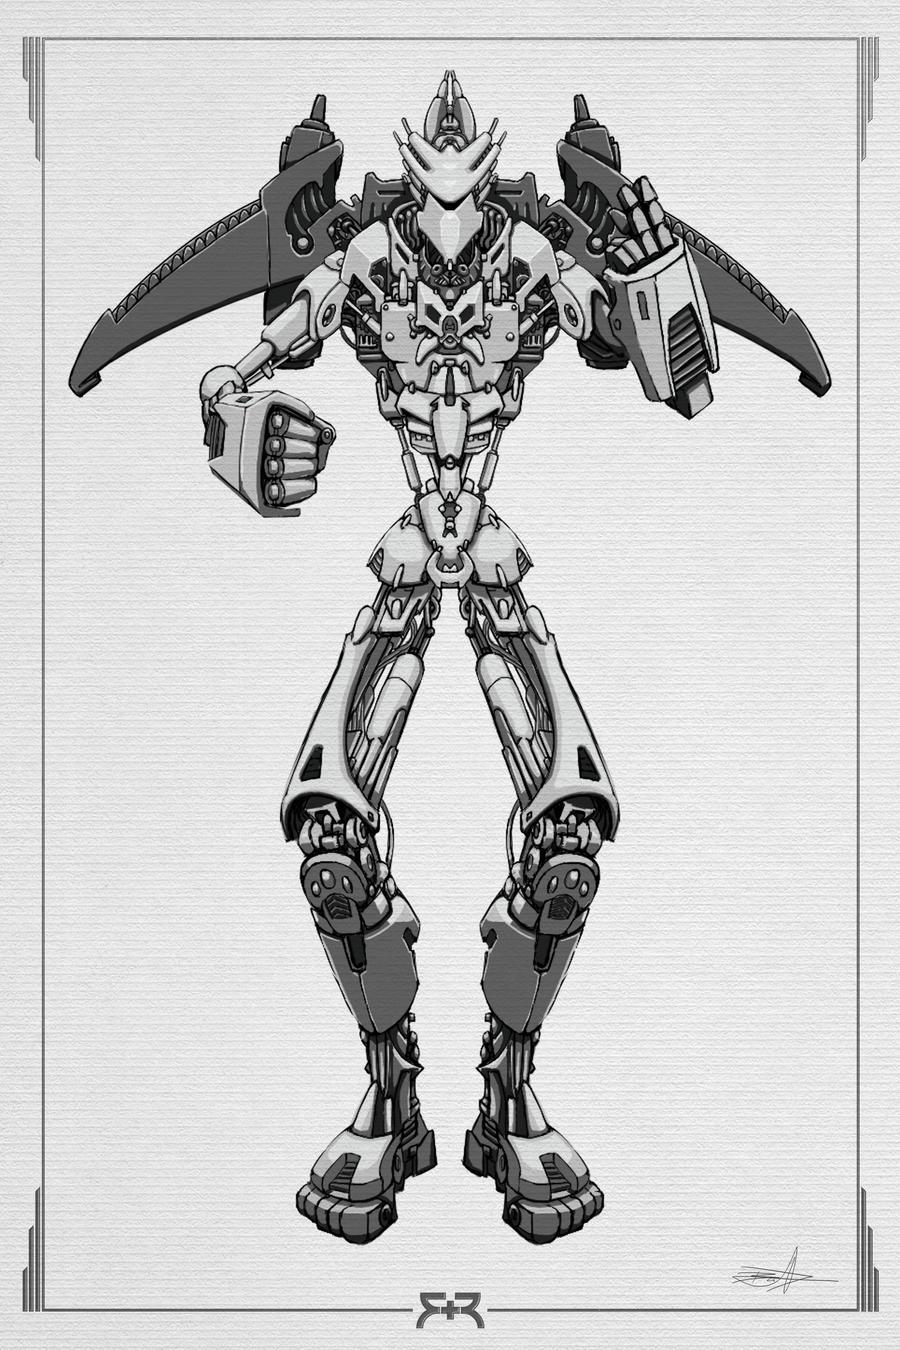 DOODLES - Robots 04 by VR-Robotica